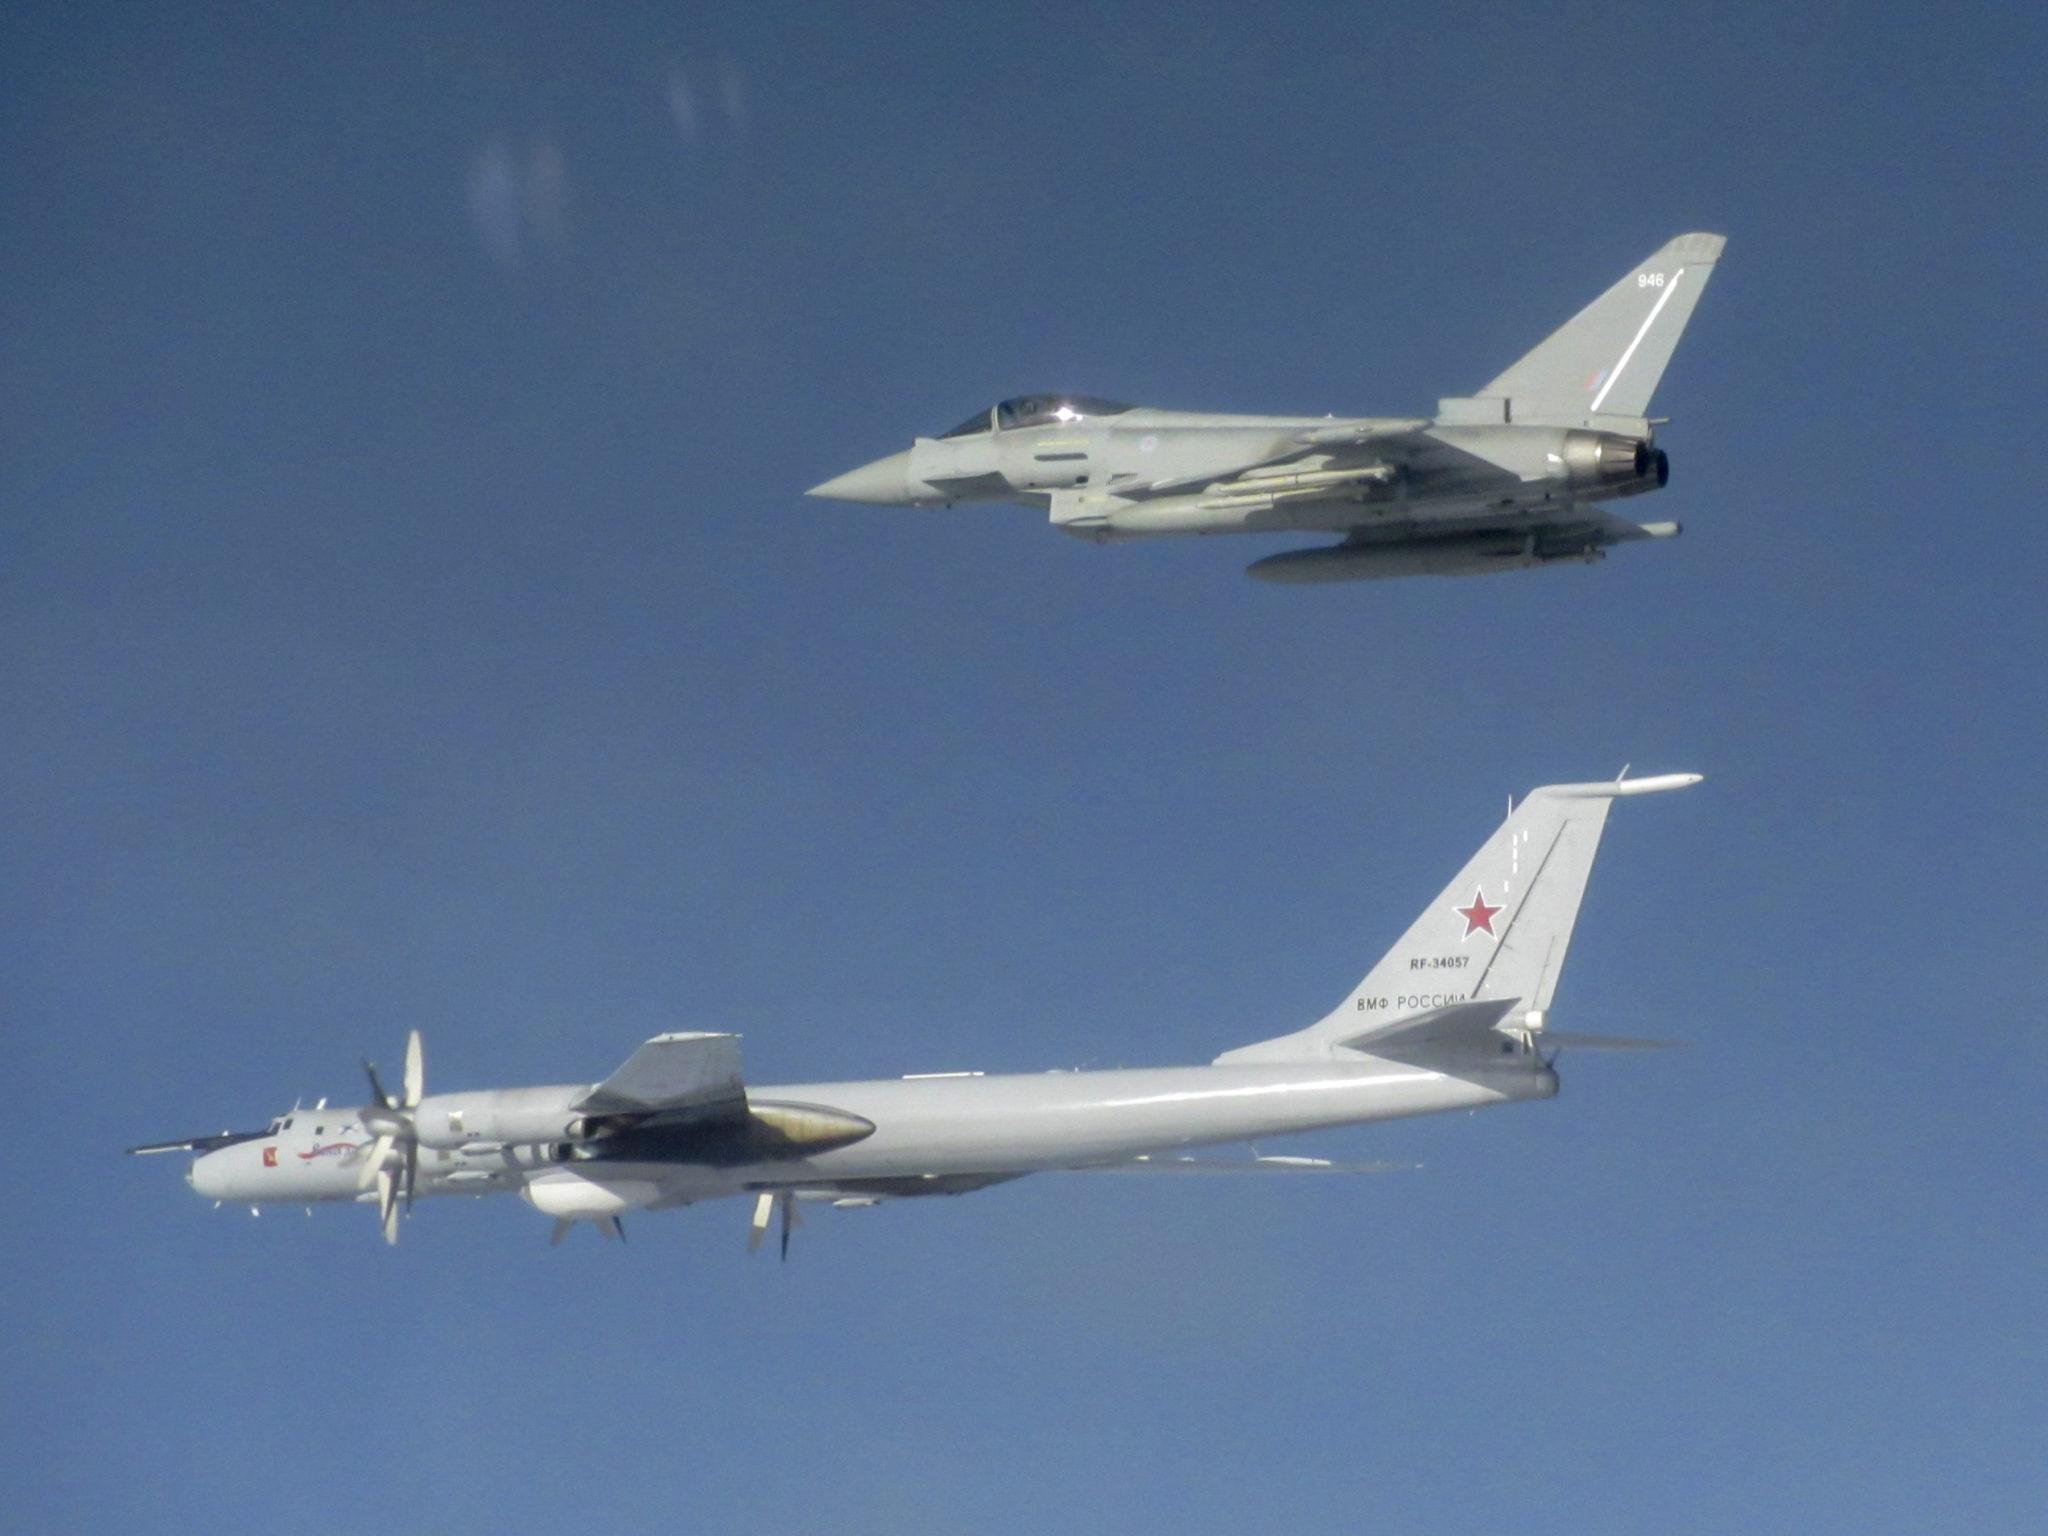 Six RAF jets intercept Russian aircraft heading for Scottish coast